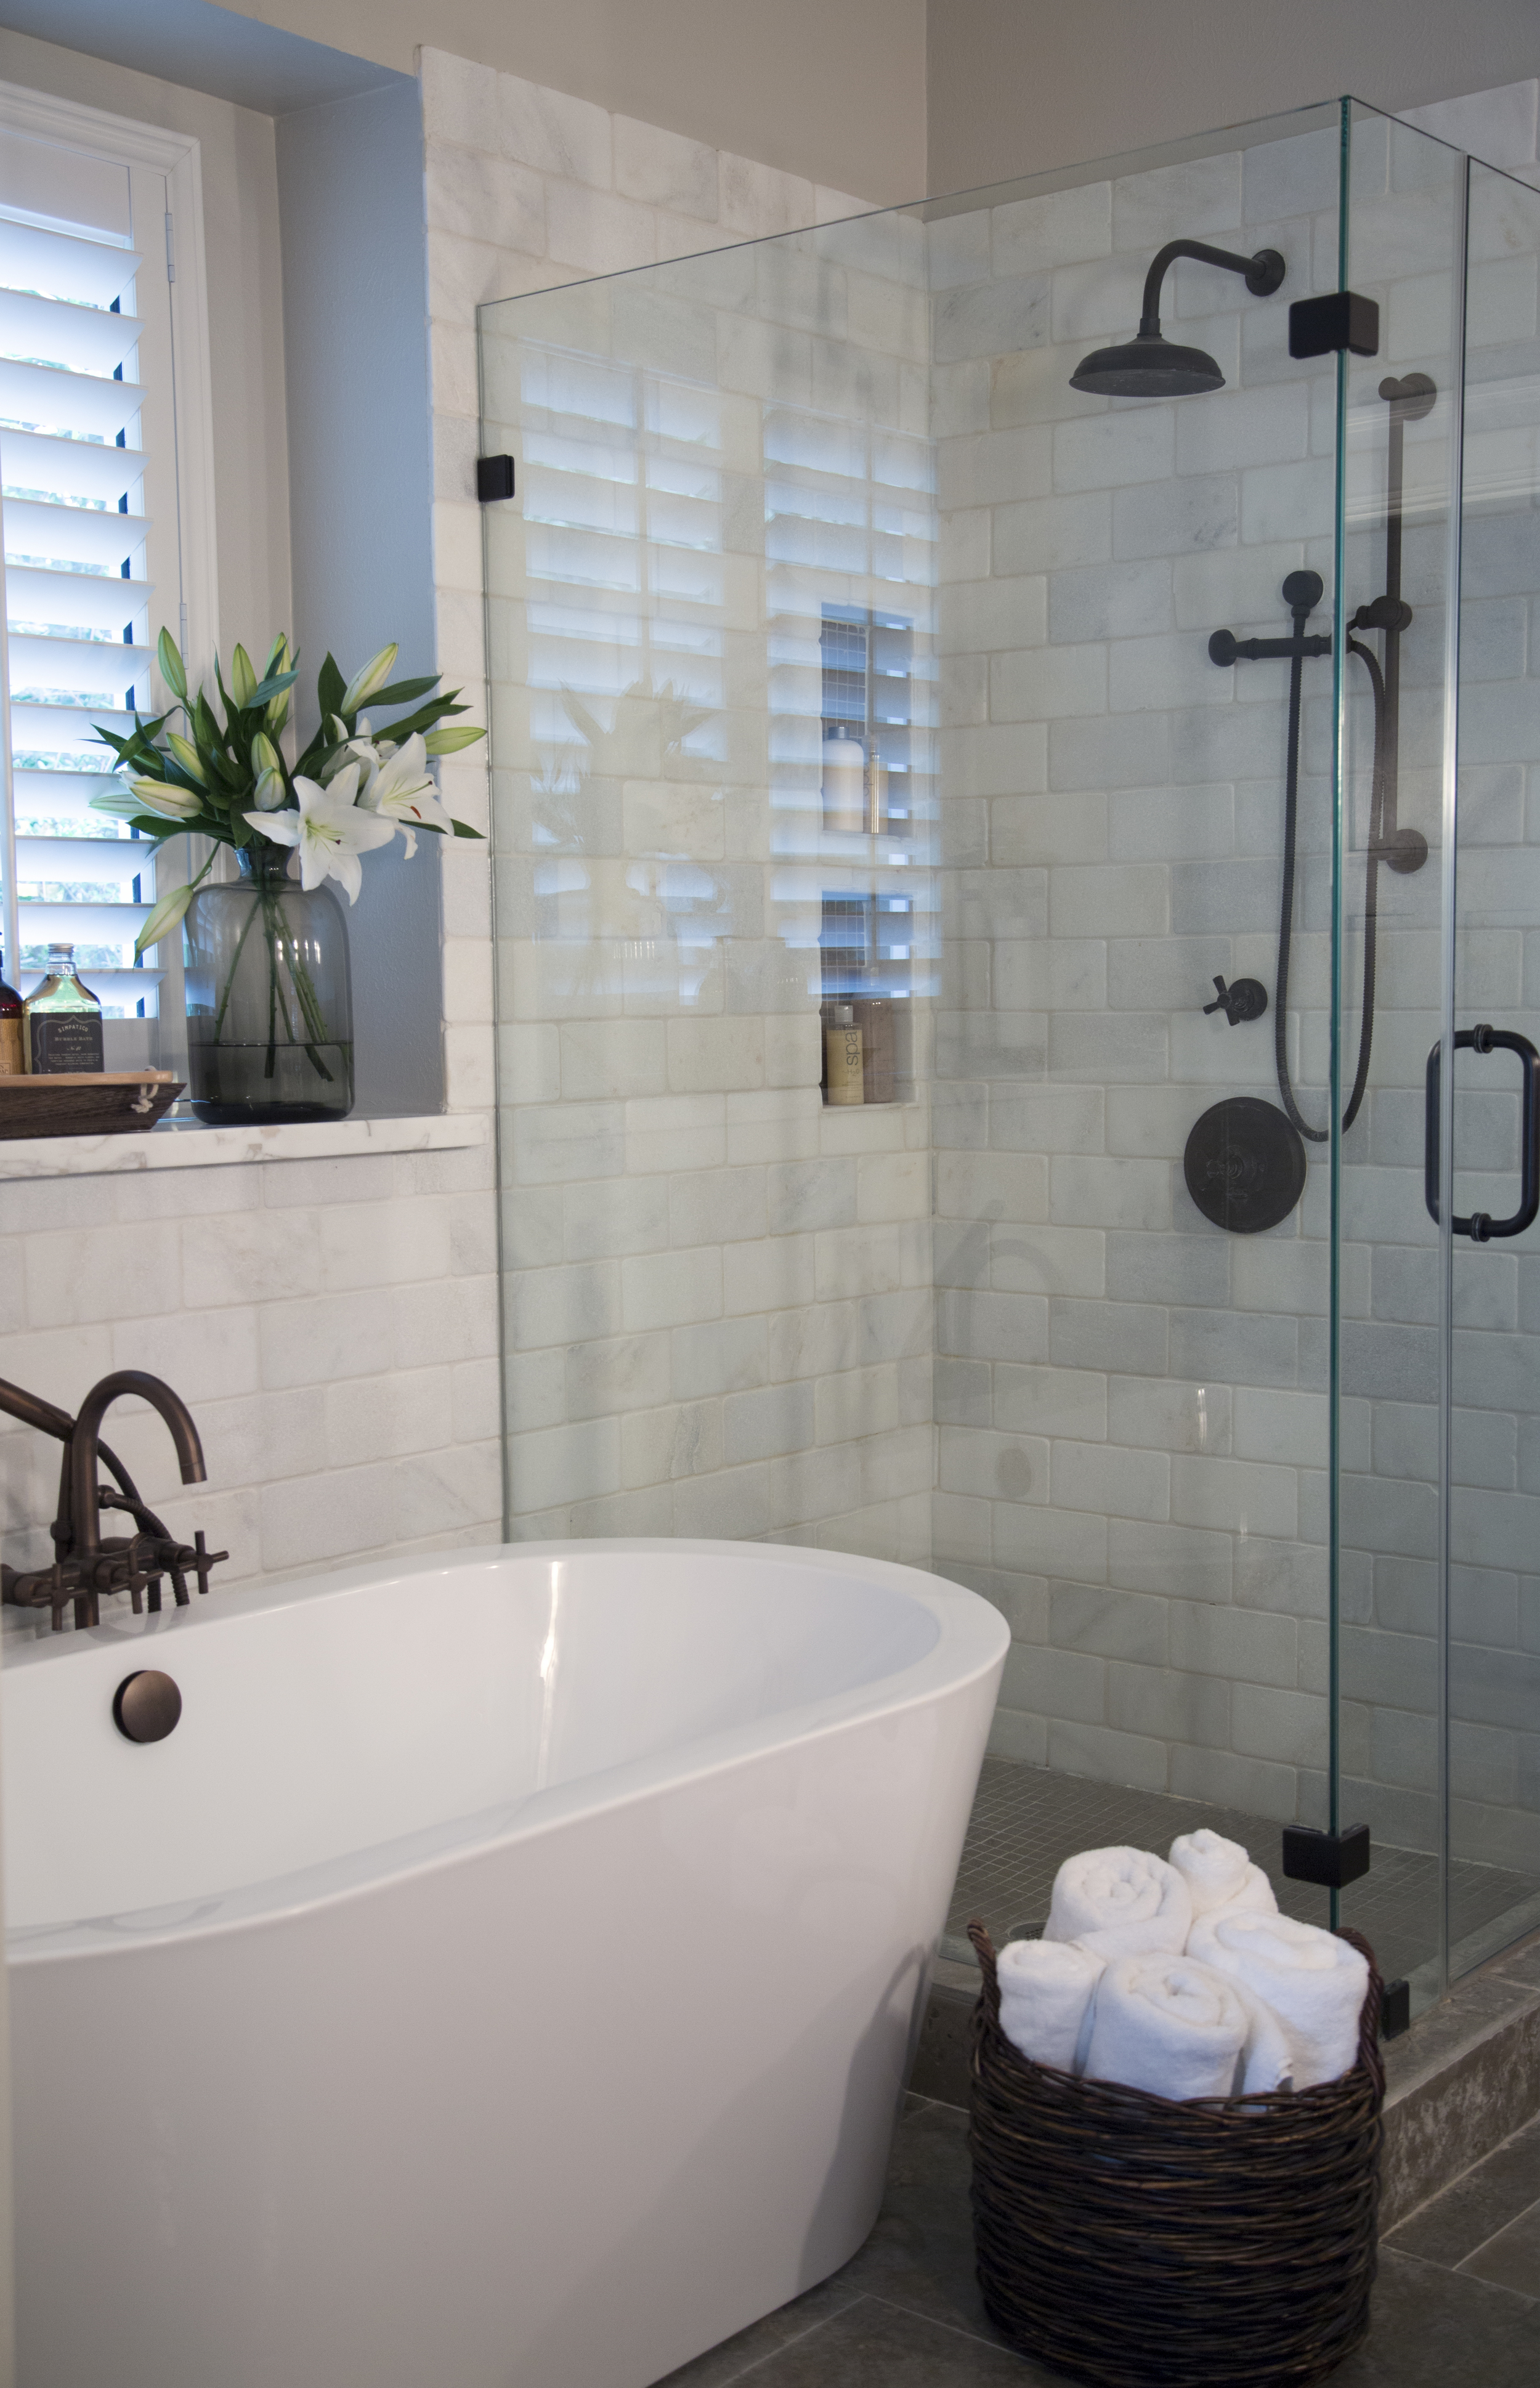 Bathroom remodeled by interior design -er Carla Aston